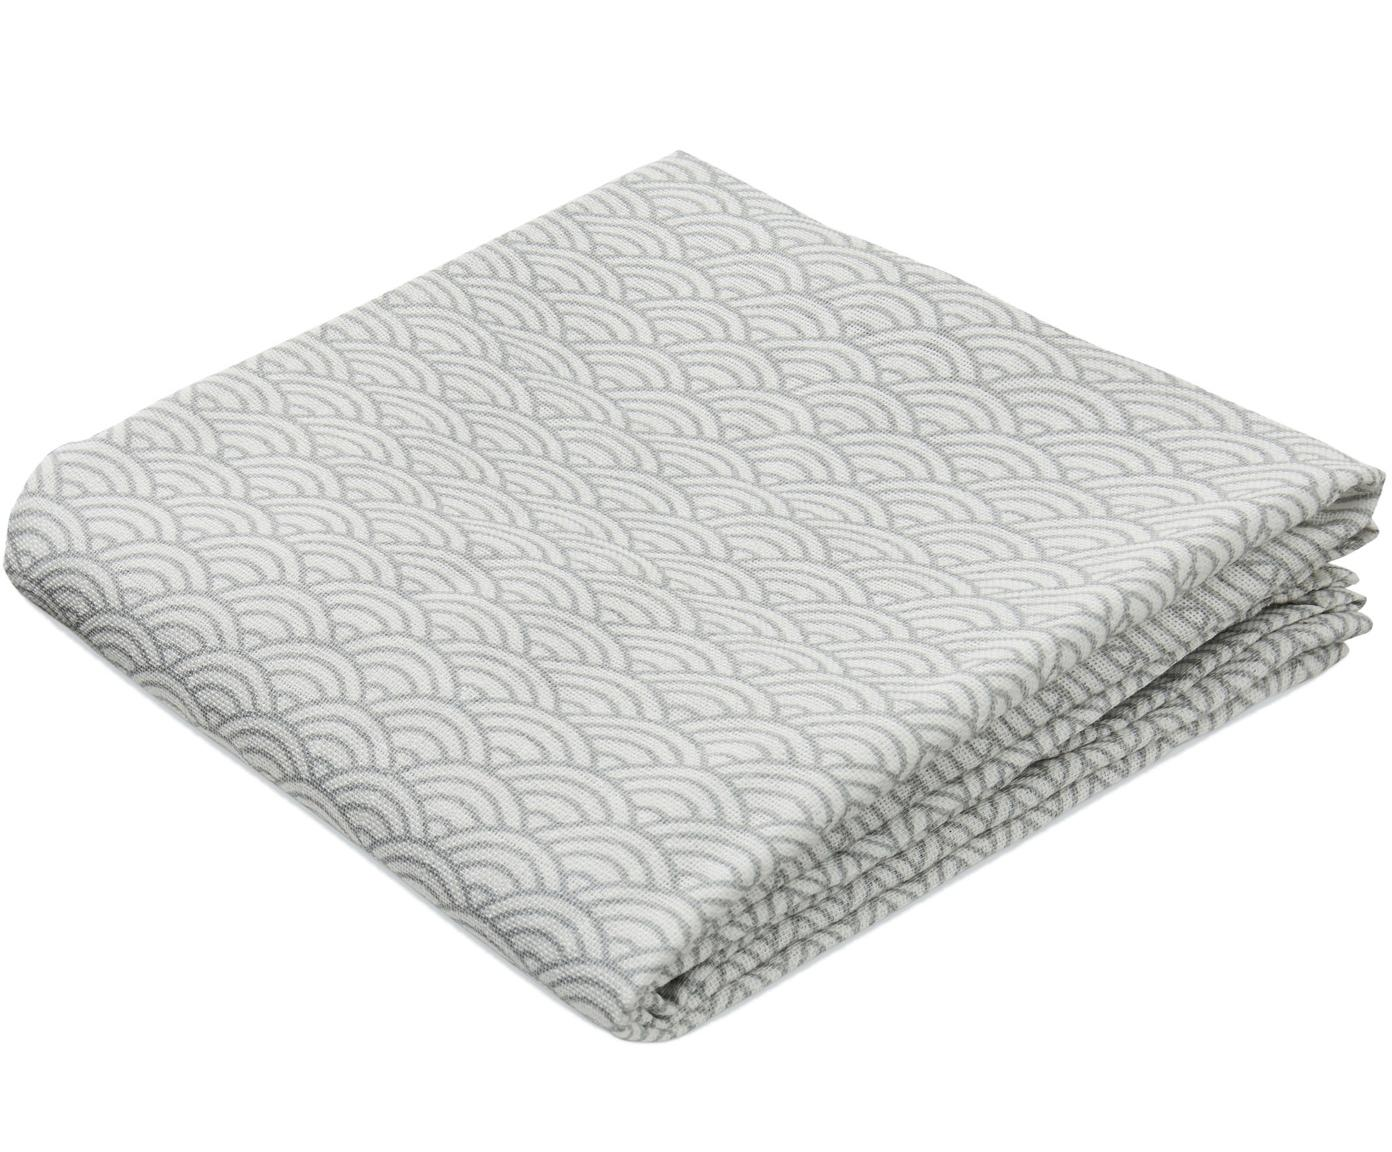 Mulltücher Wave aus Bio-Baumwolle, 2 Stück, Bio-Baumwolle, GOTS-zertifiziert, Grau, Weiss, 70 x 70 cm